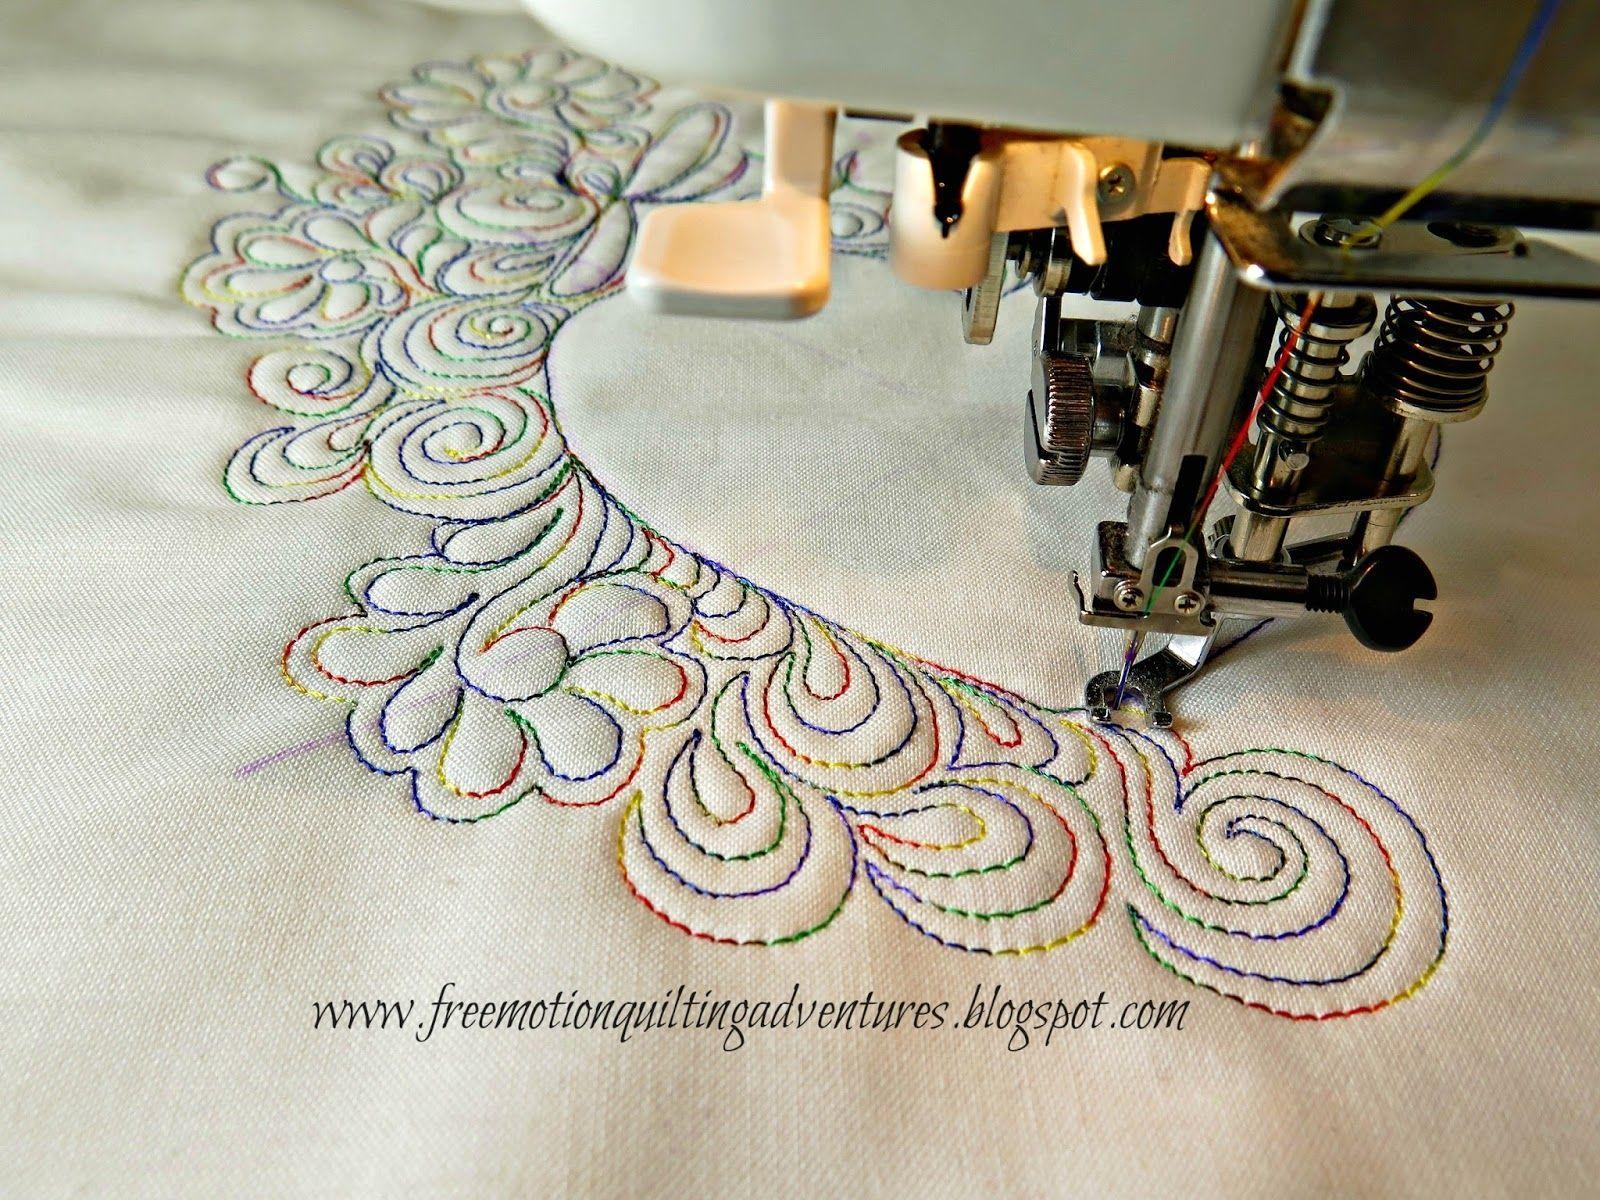 Free motion quilting friends | quilt | Pinterest | Acolchados, Tela ...